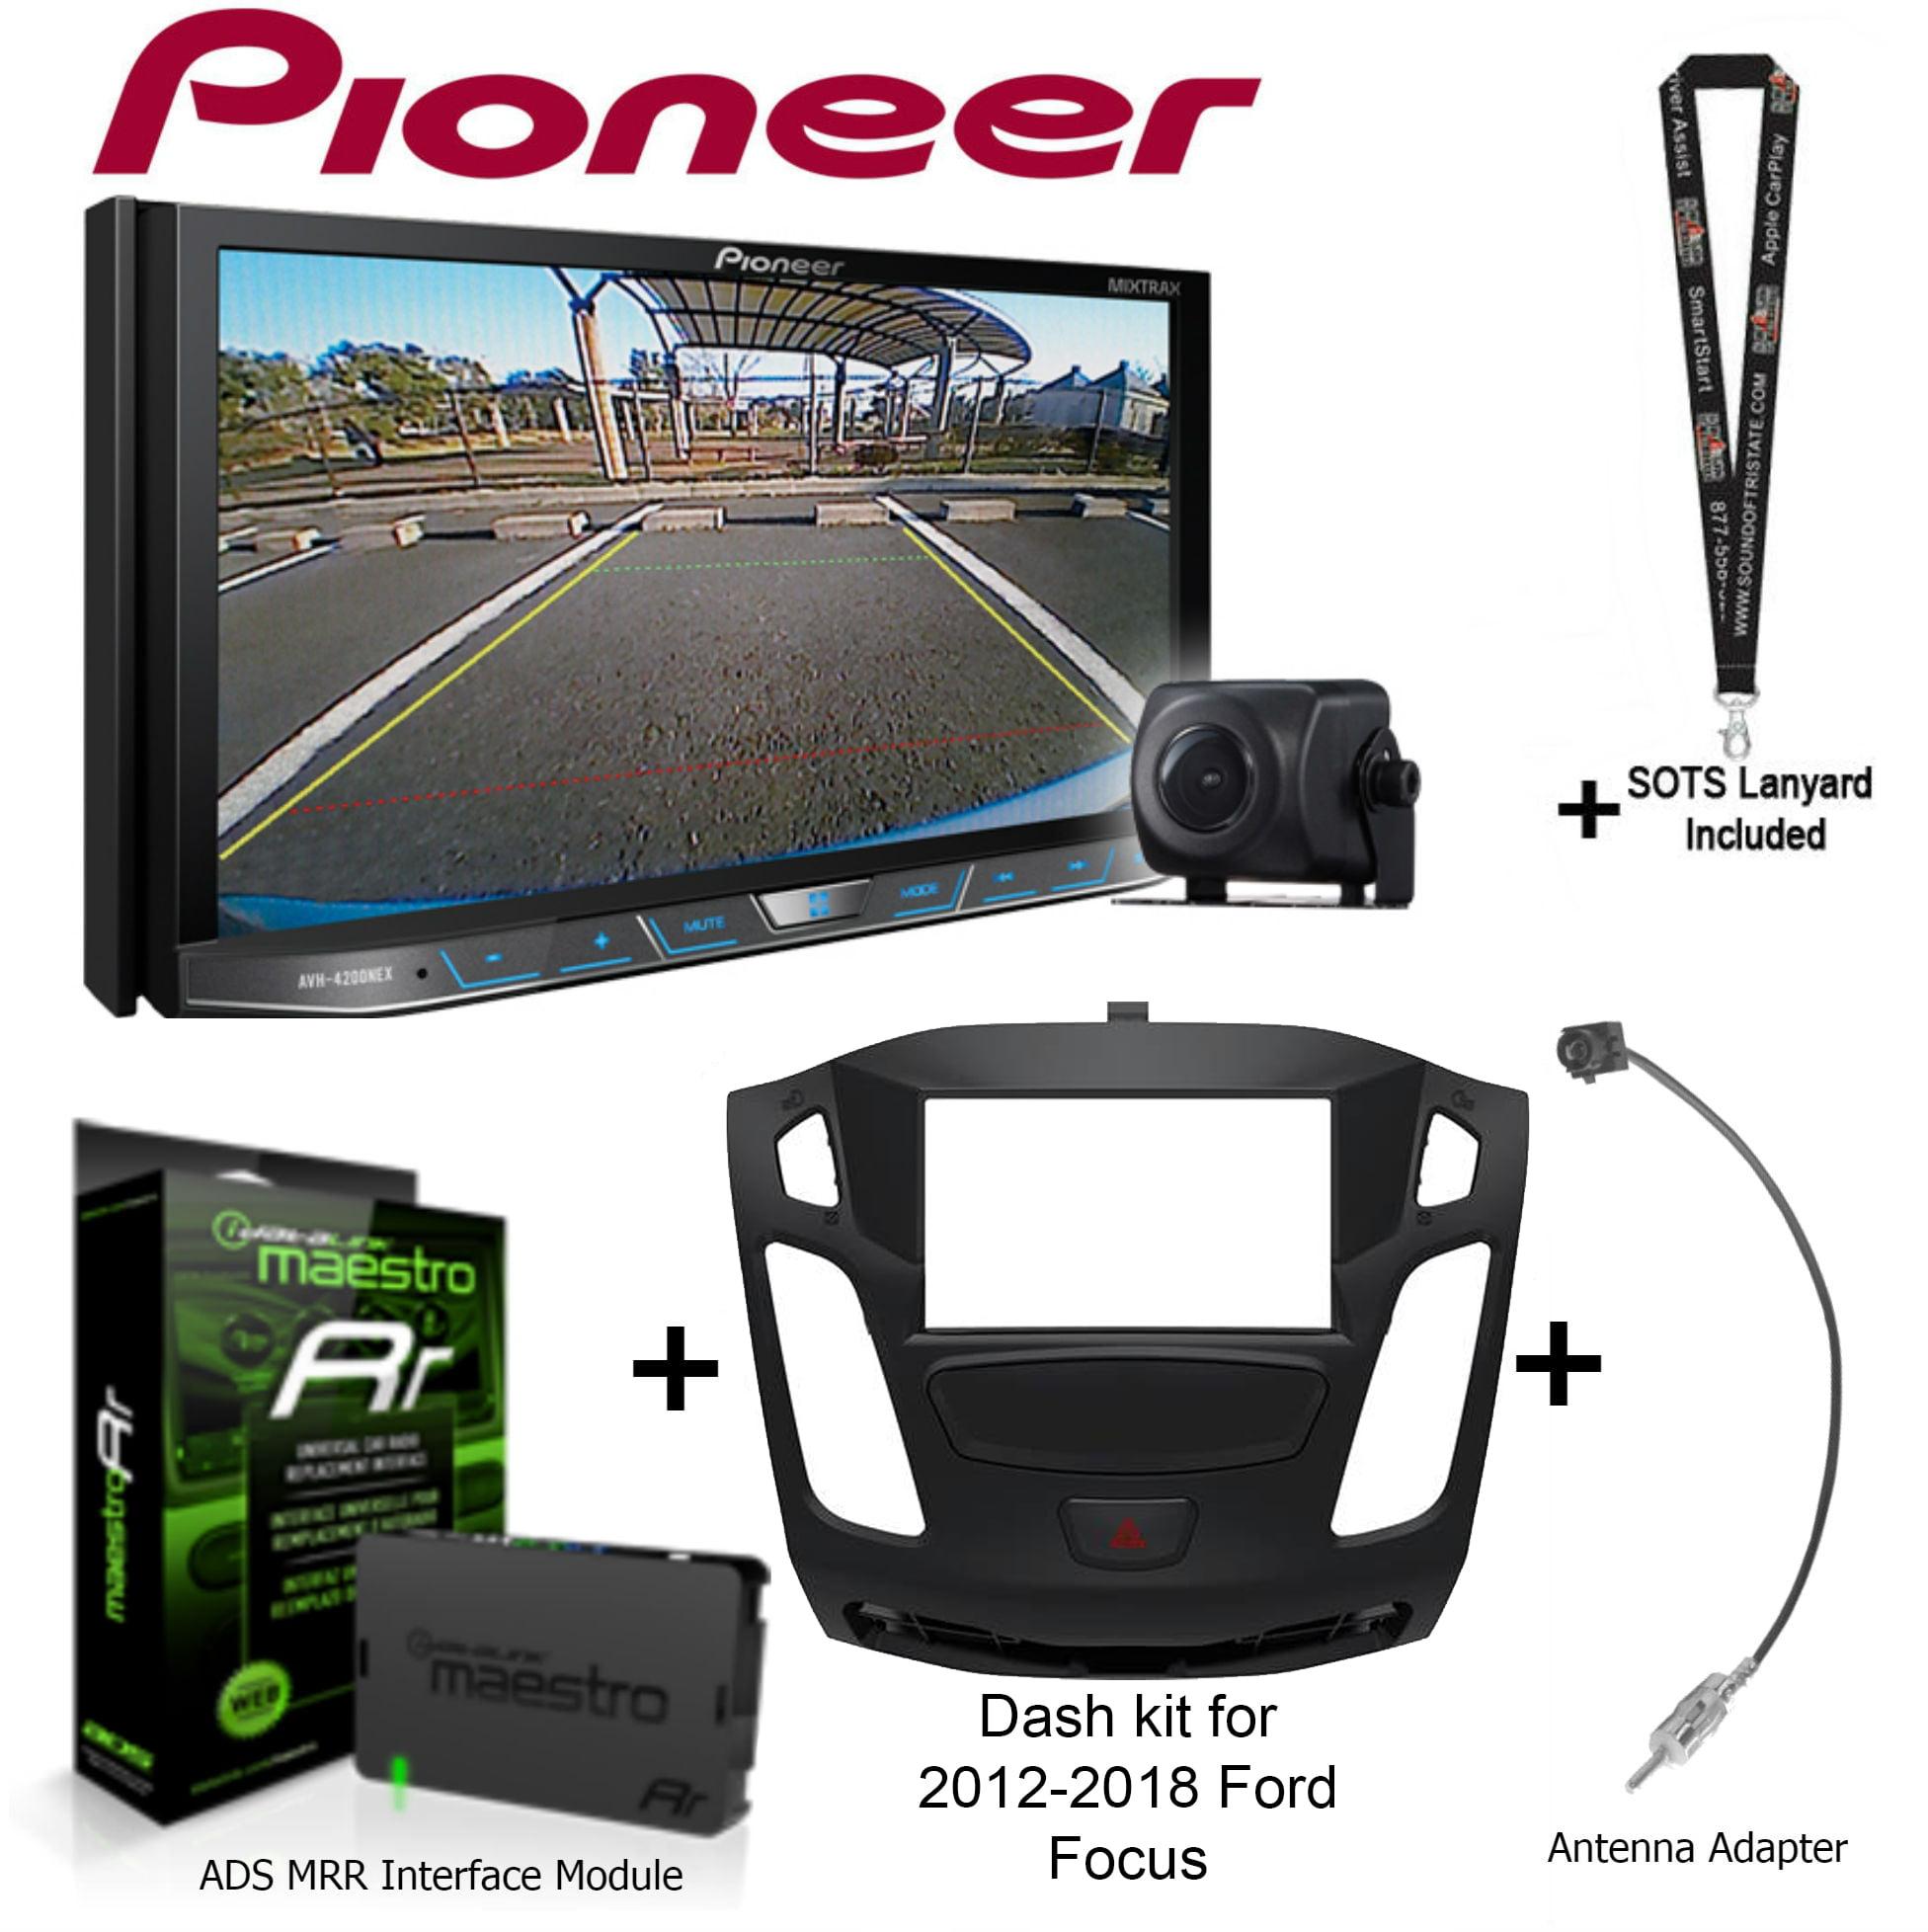 "Pioneer AVH-4201NEX 7"" DVD Receiver, iDatalink Maestro KIT-FOC1 Dash kit for 2012-2018 Ford Focus, ADS-MRR... by Pioneer"